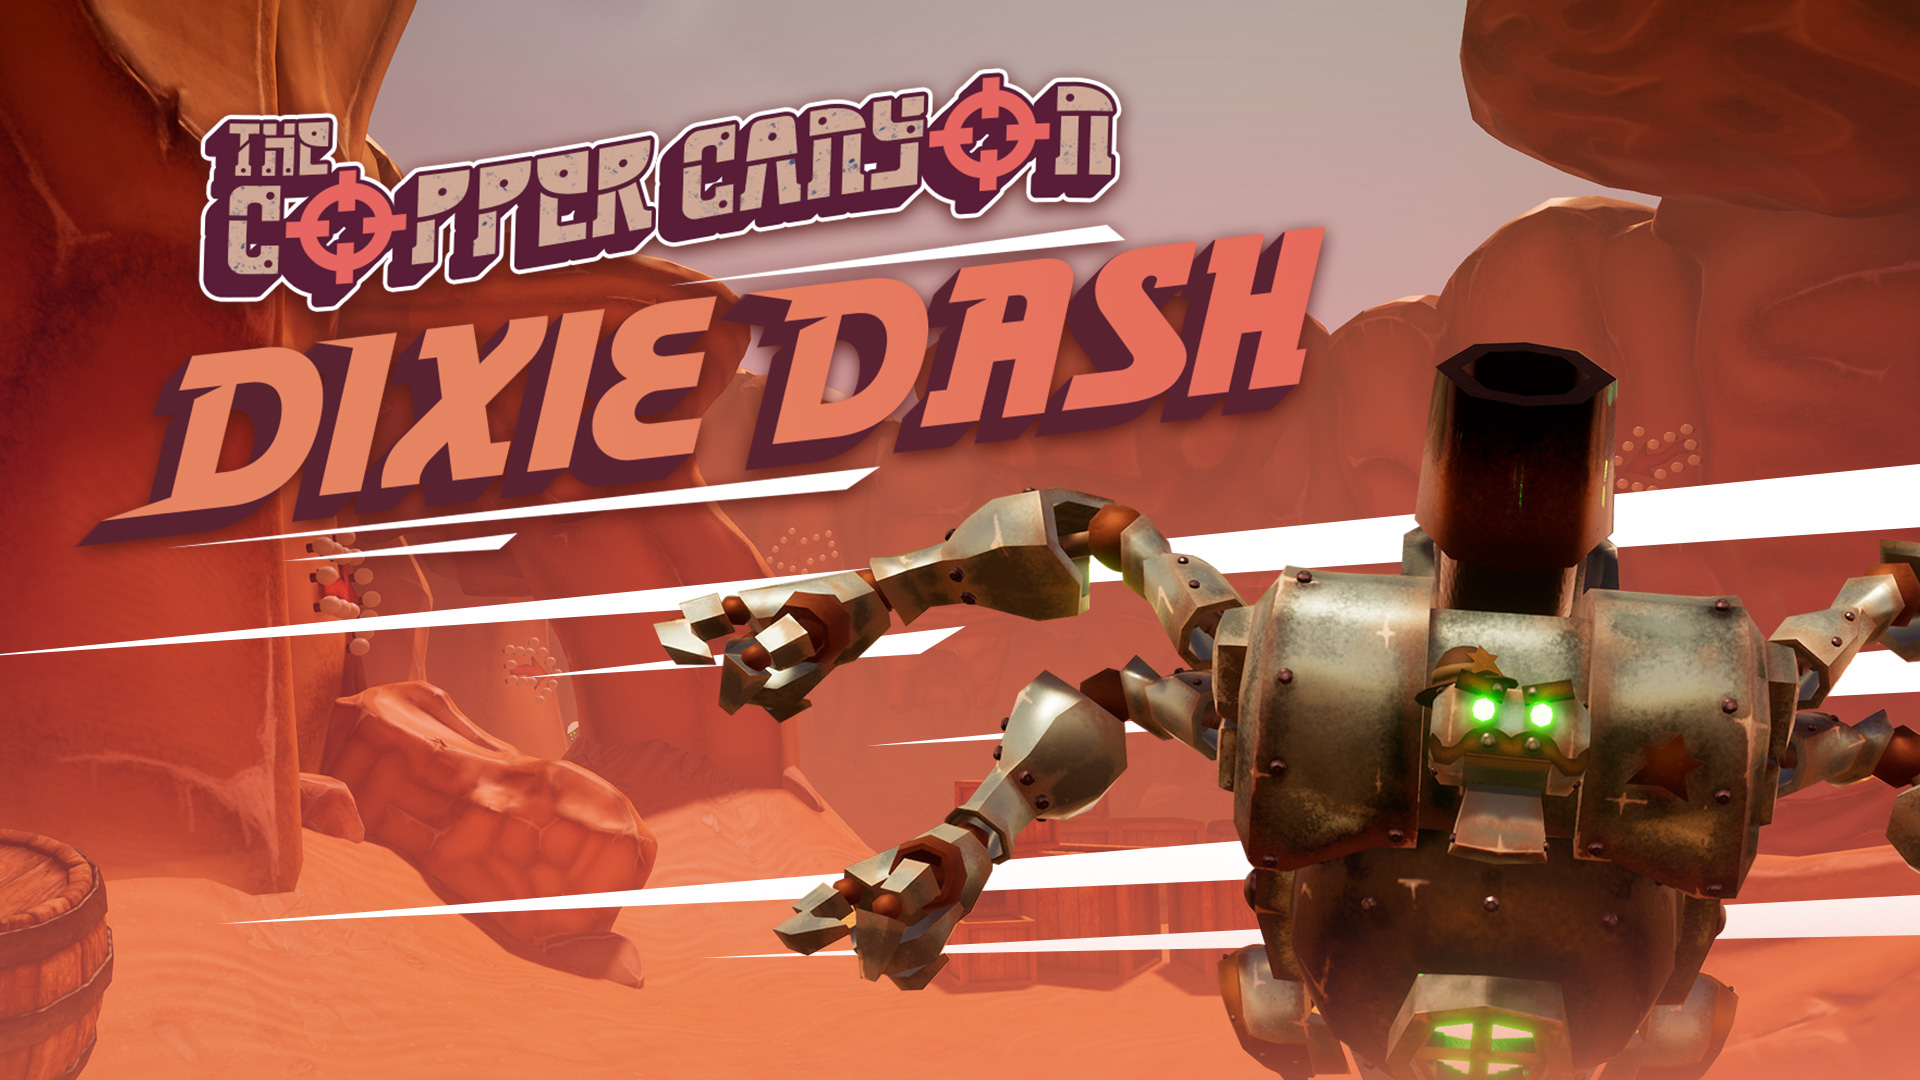 Copper Canyon Dixie Dash